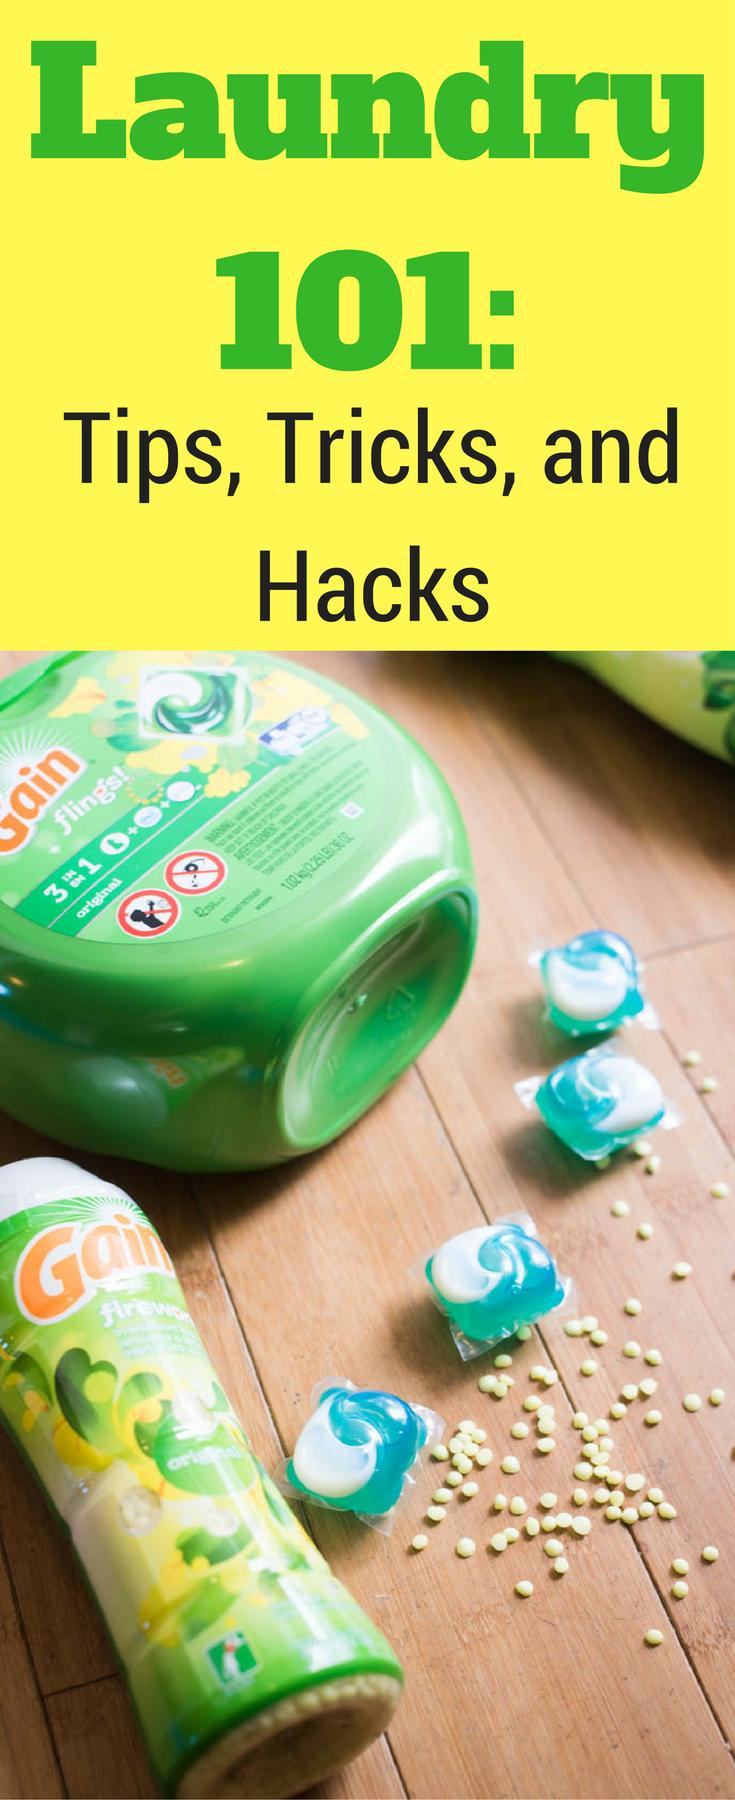 Laundry Hacks / Laundry Tips / Laundry Room Ideas / Stain Removal Tips / Cleaning Tips / Cleaning / Laundry Detergent / how to do laundry via @clarkscondensed